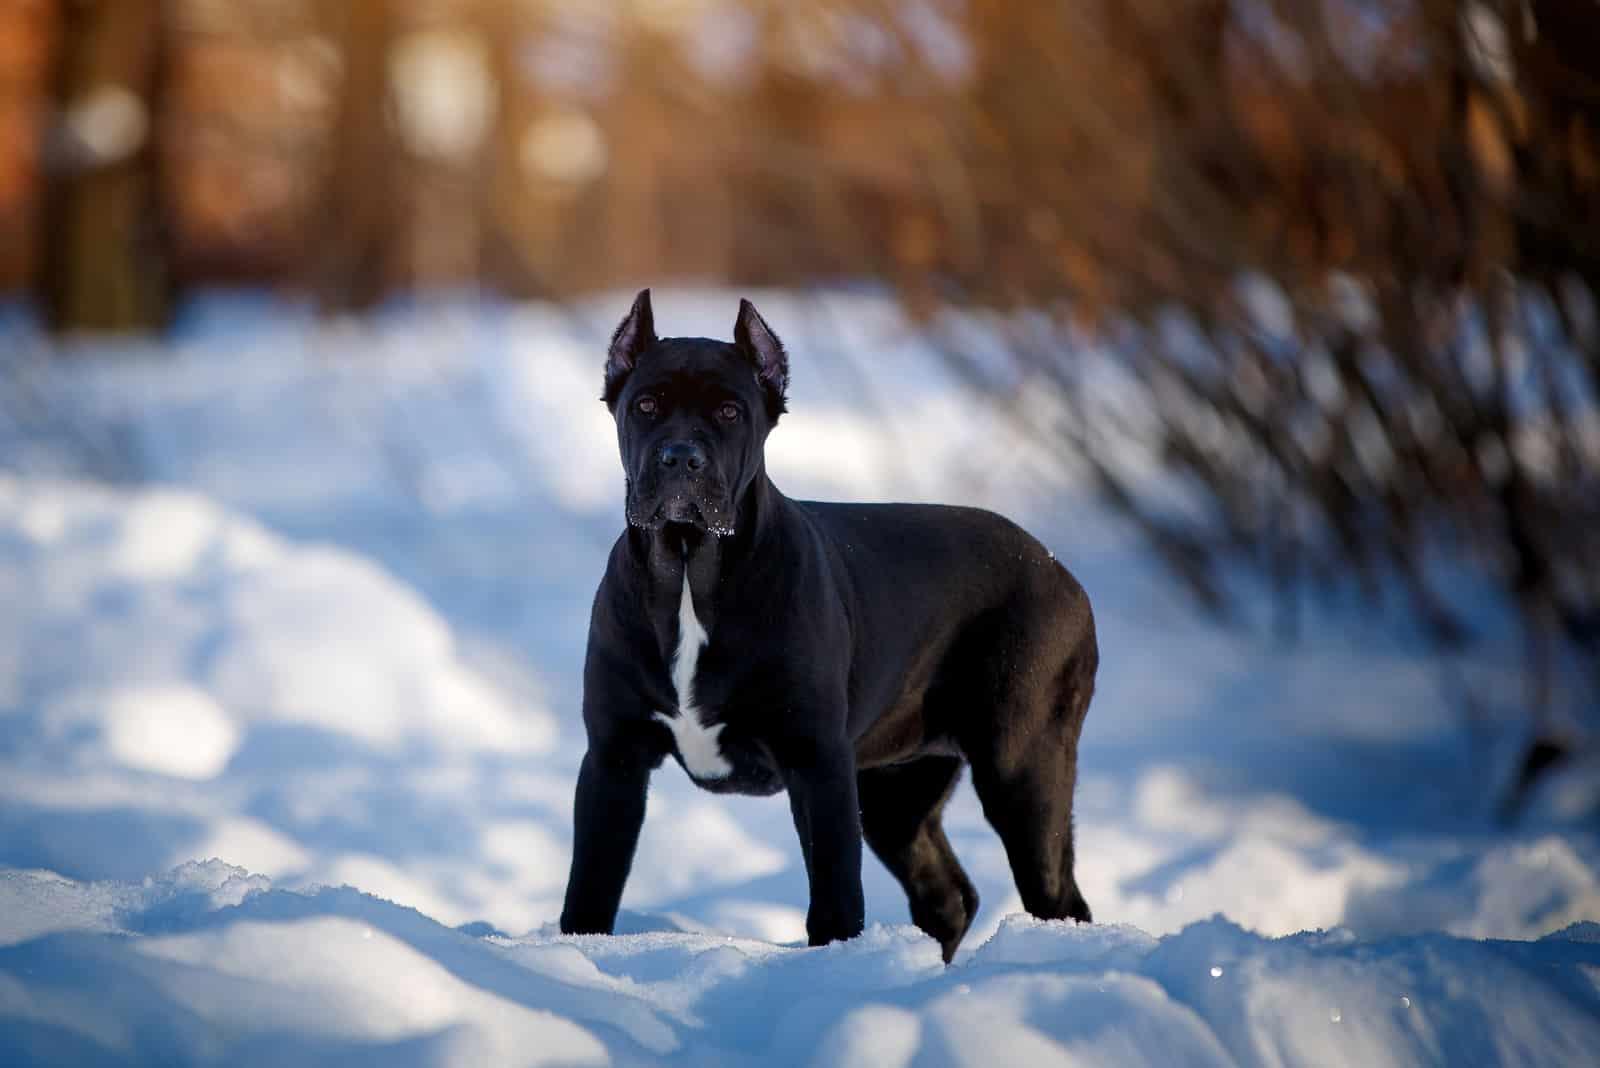 Beautiful black Cane Corso dog in winter nature